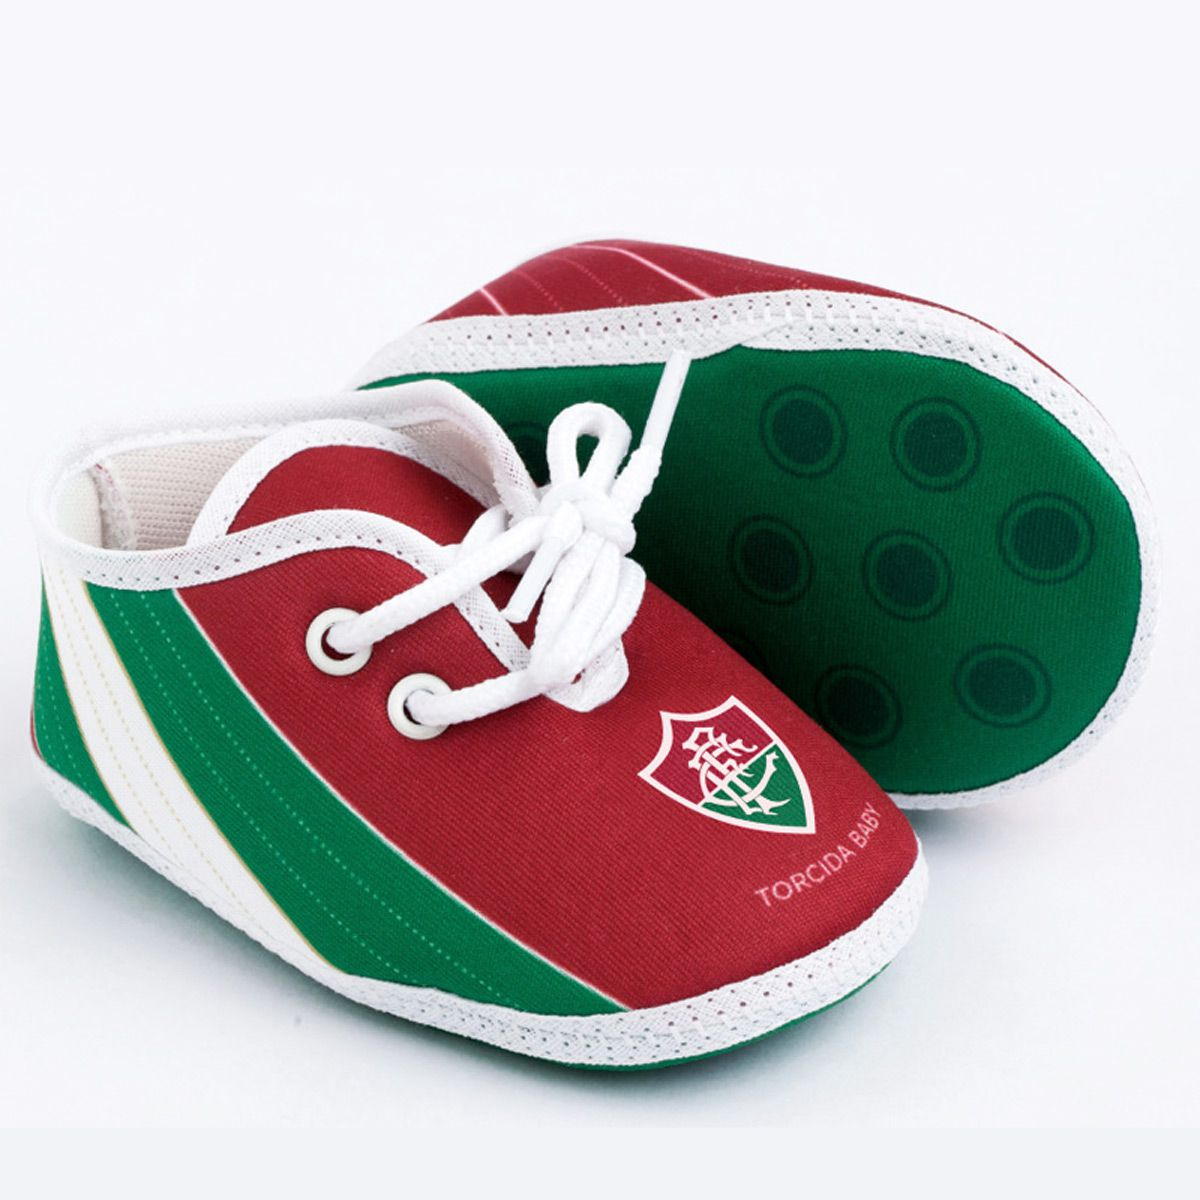 Chuteira para Bebê do Fluminense - 003B